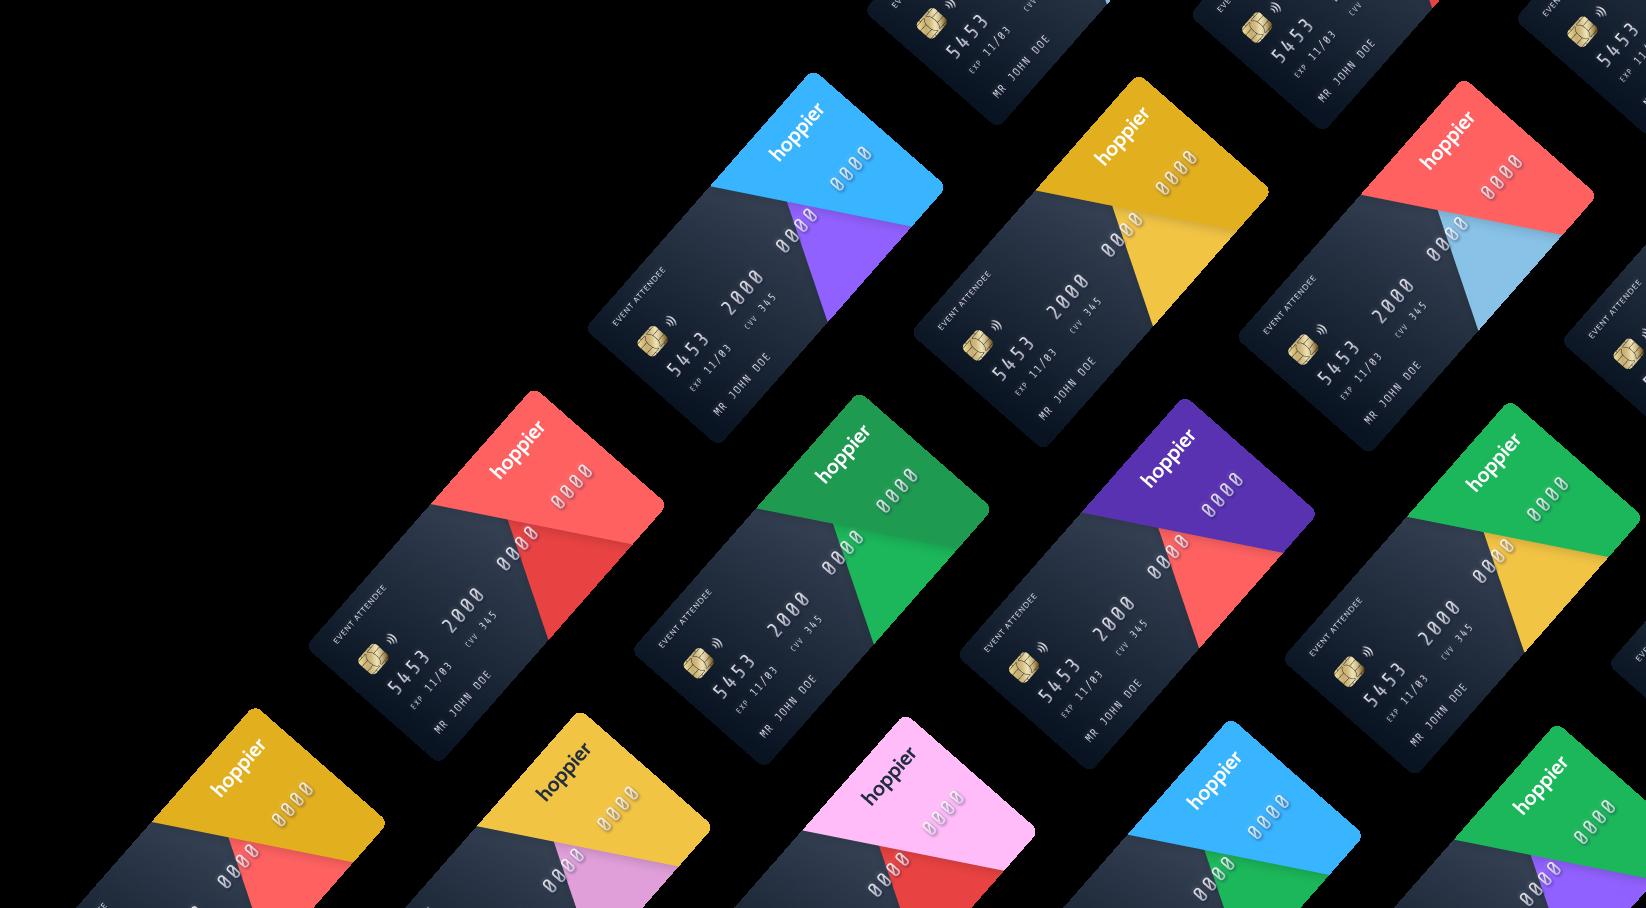 Hoppier cards with different branding for sponsors